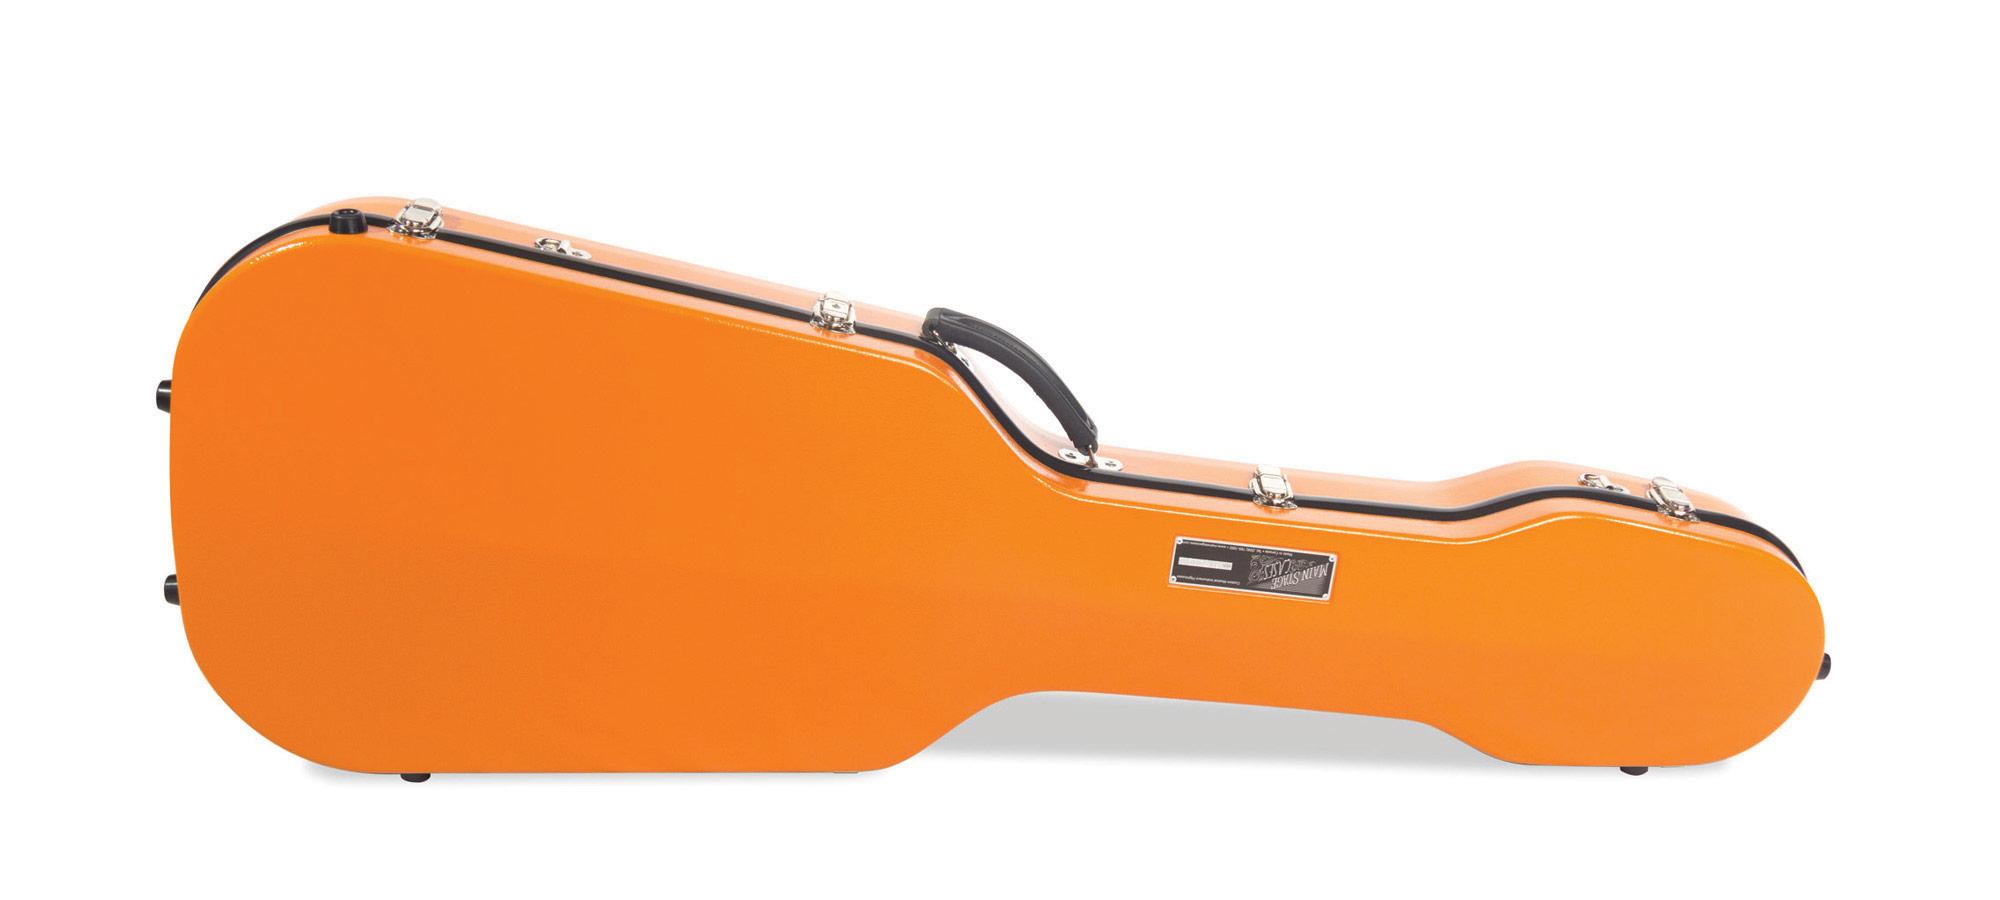 mainstage-bass-orange